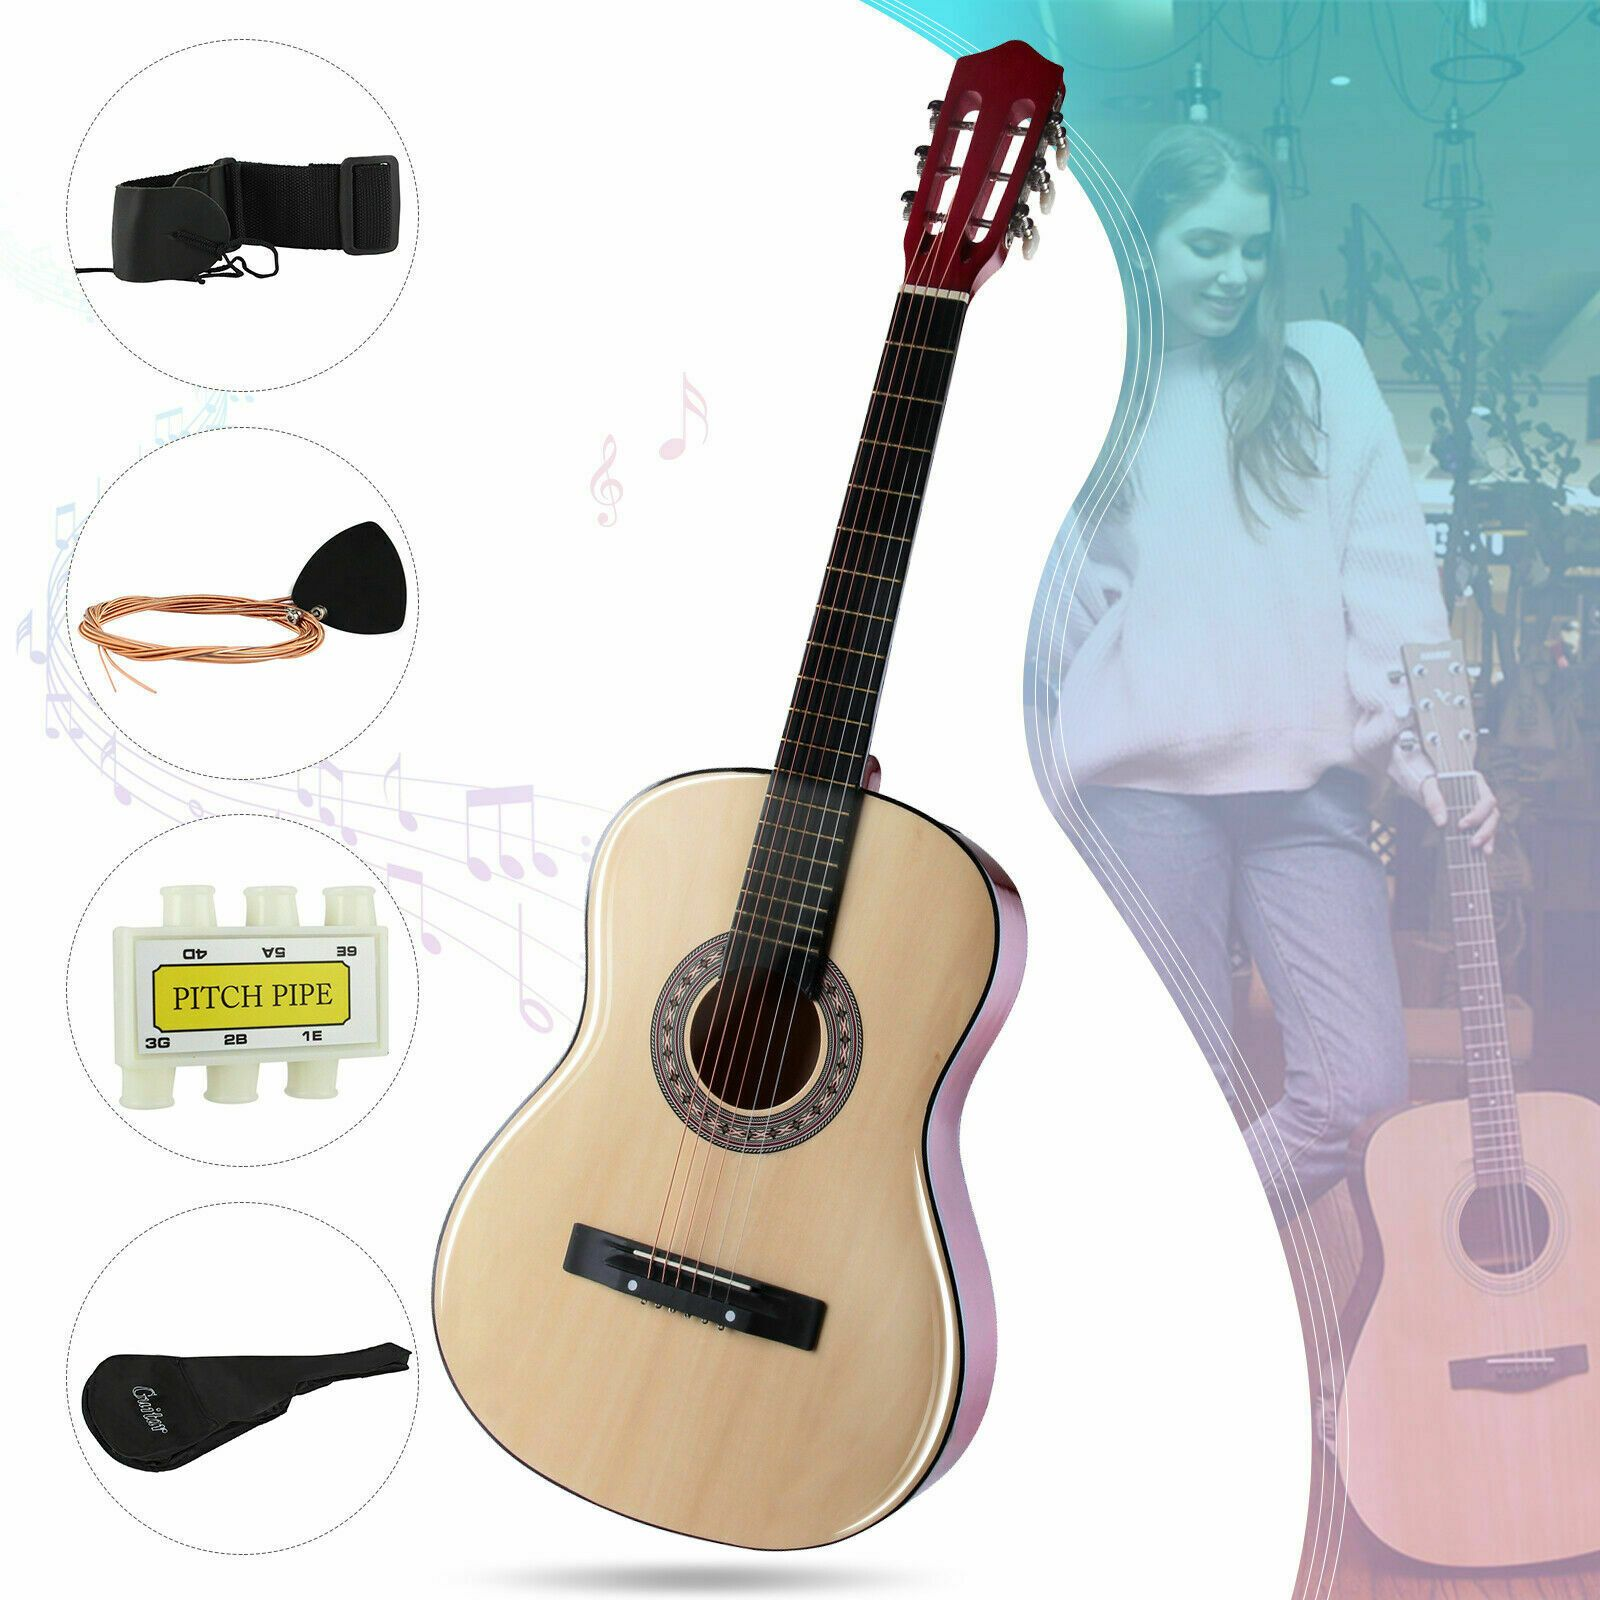 38 Beginners Acoustic Guitar With Case Straptuner Pick Steel Strings Brown Guitar Ideas Of Guitar Guitar Acoustic Guitar Tuners Guitar Acoustic Guitar